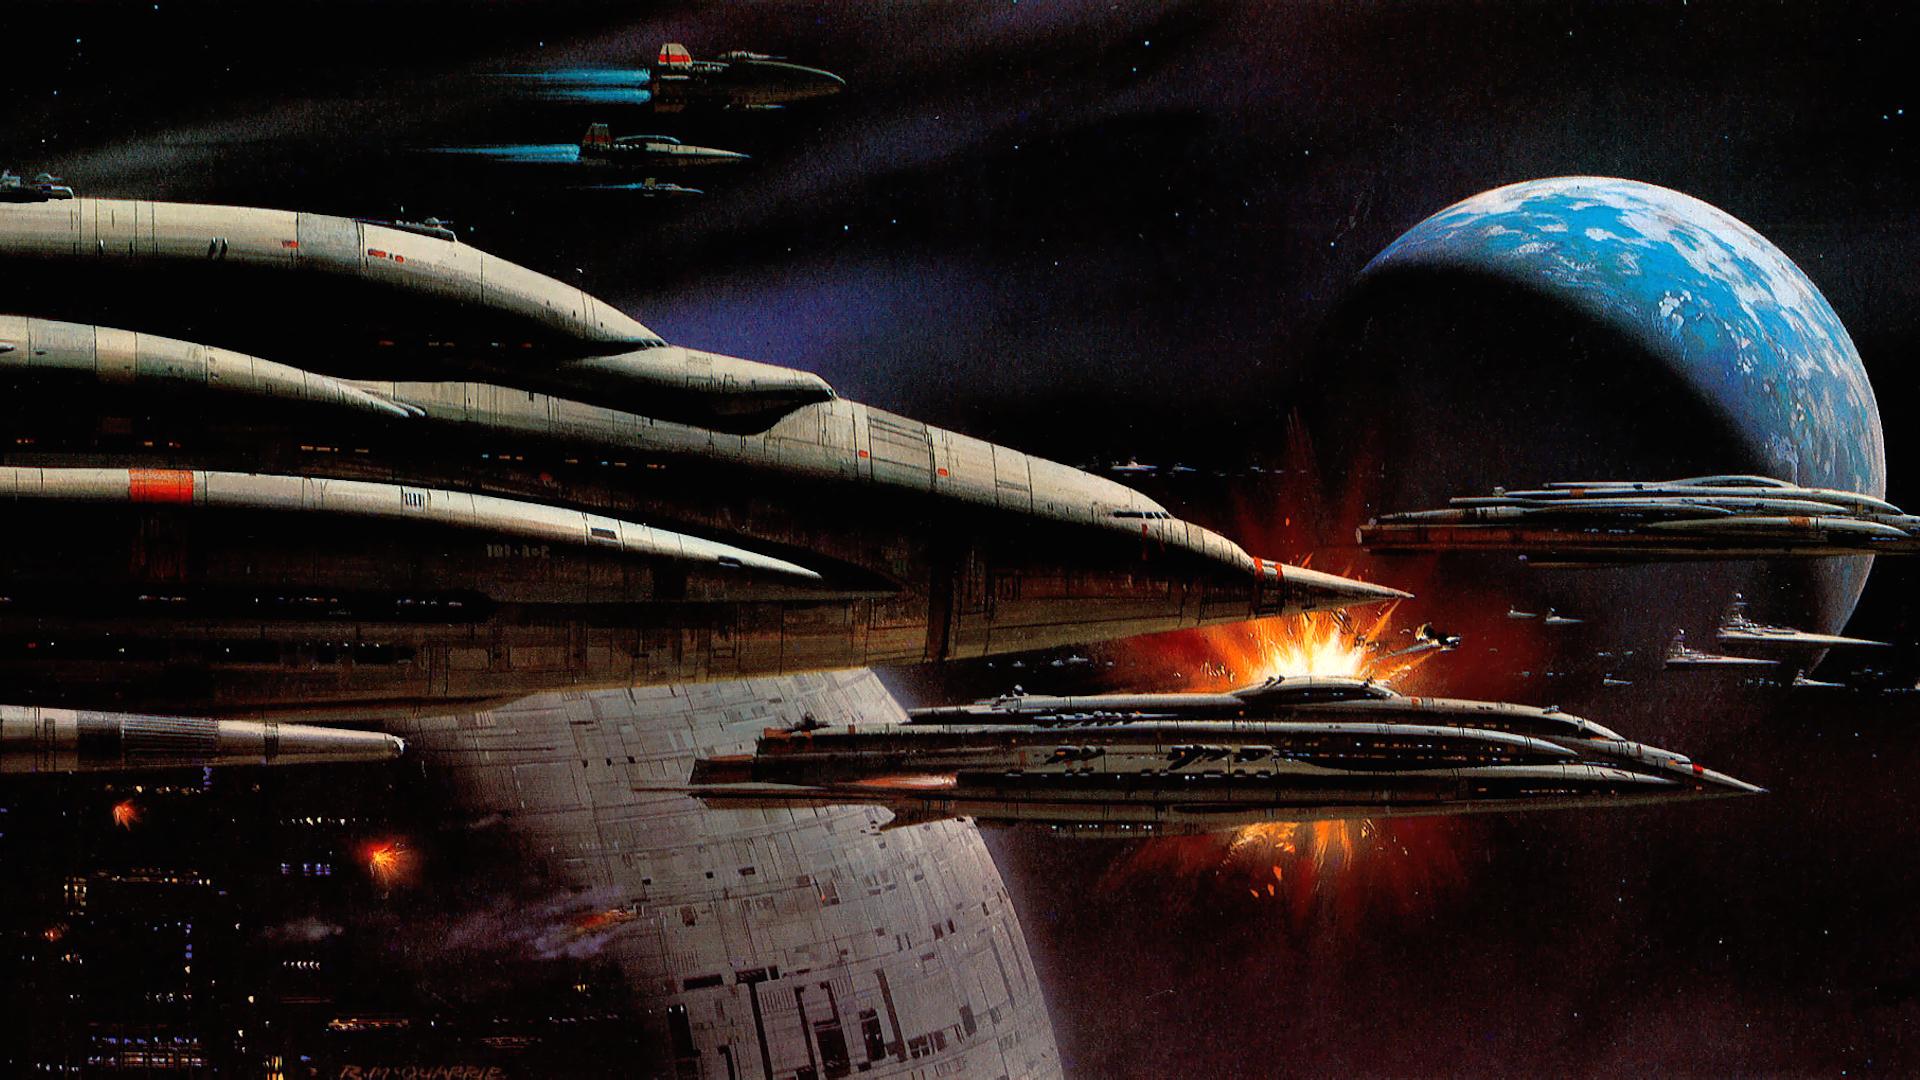 Ralph-McQuarrie-Star-Wars-Concept-Art-Part-Album-on-Imgur-wallpaper-wpc5808349